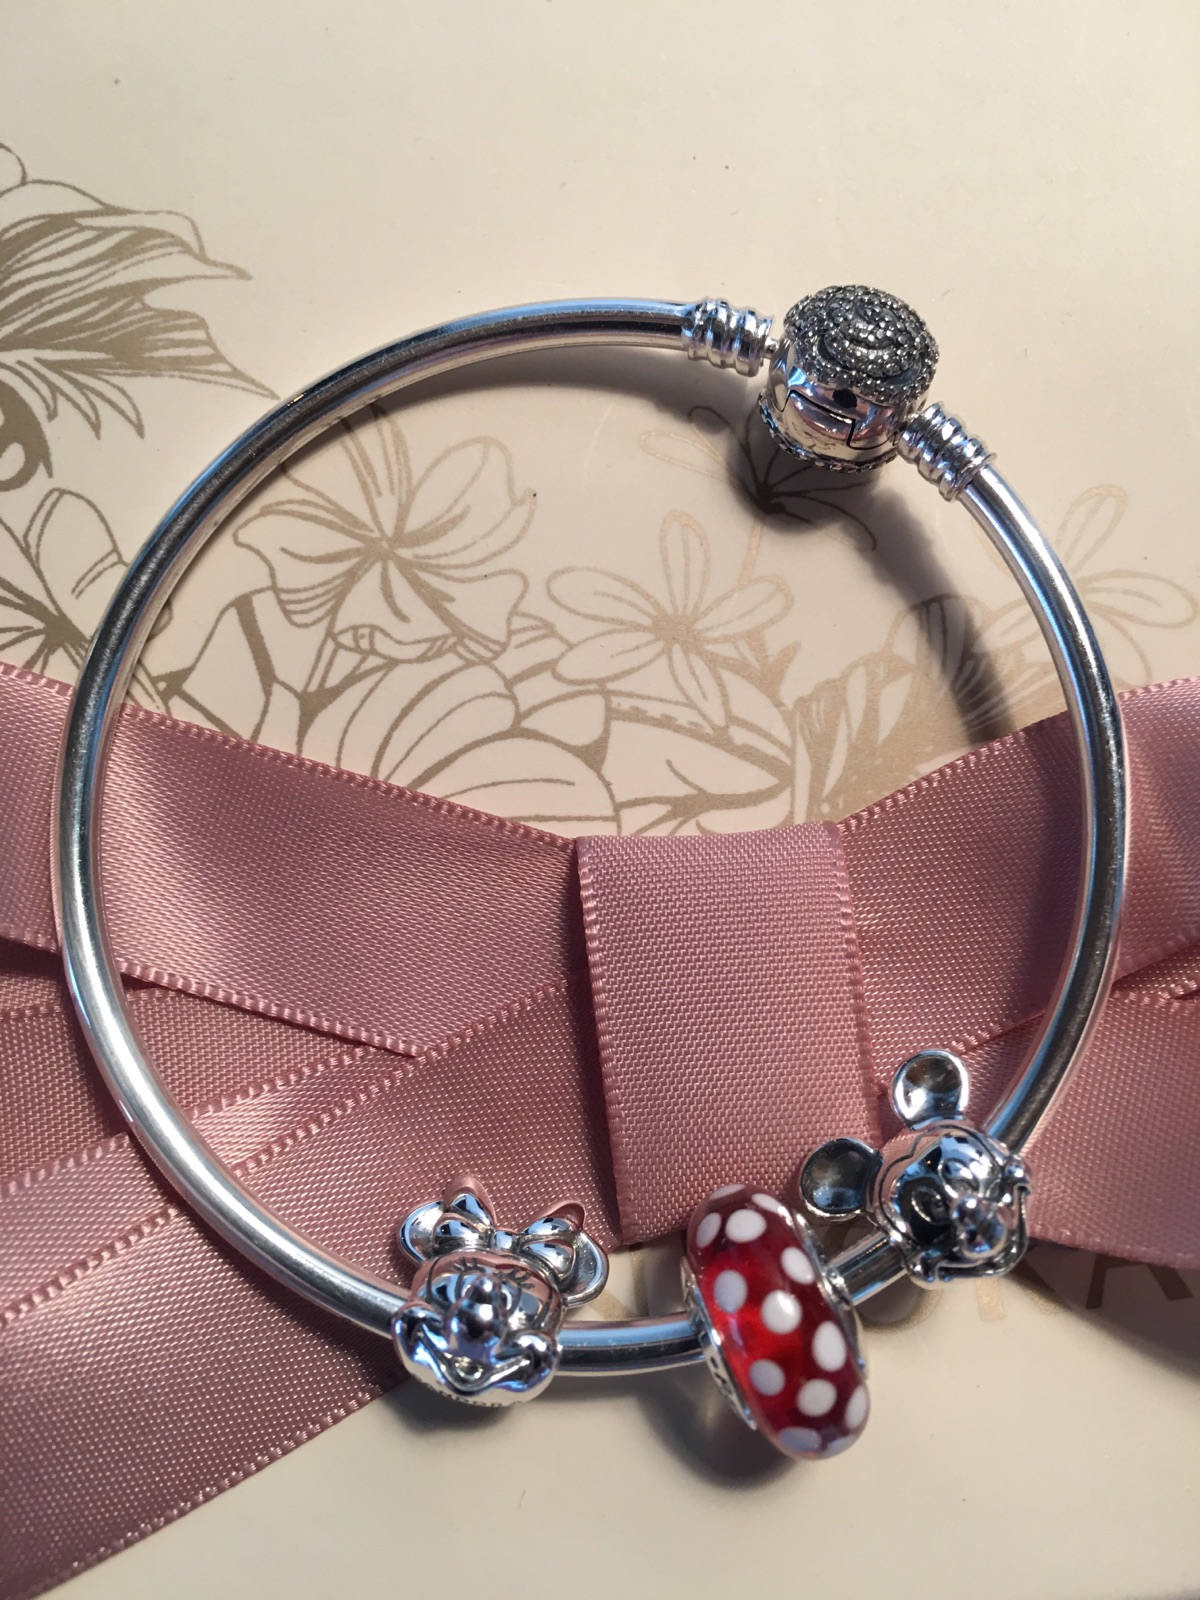 Authentic Pandora Disney Beauty And The Beast Bangle Mickey Minnie Bracelet Three Charm Gift Set Mothers Daybirthday